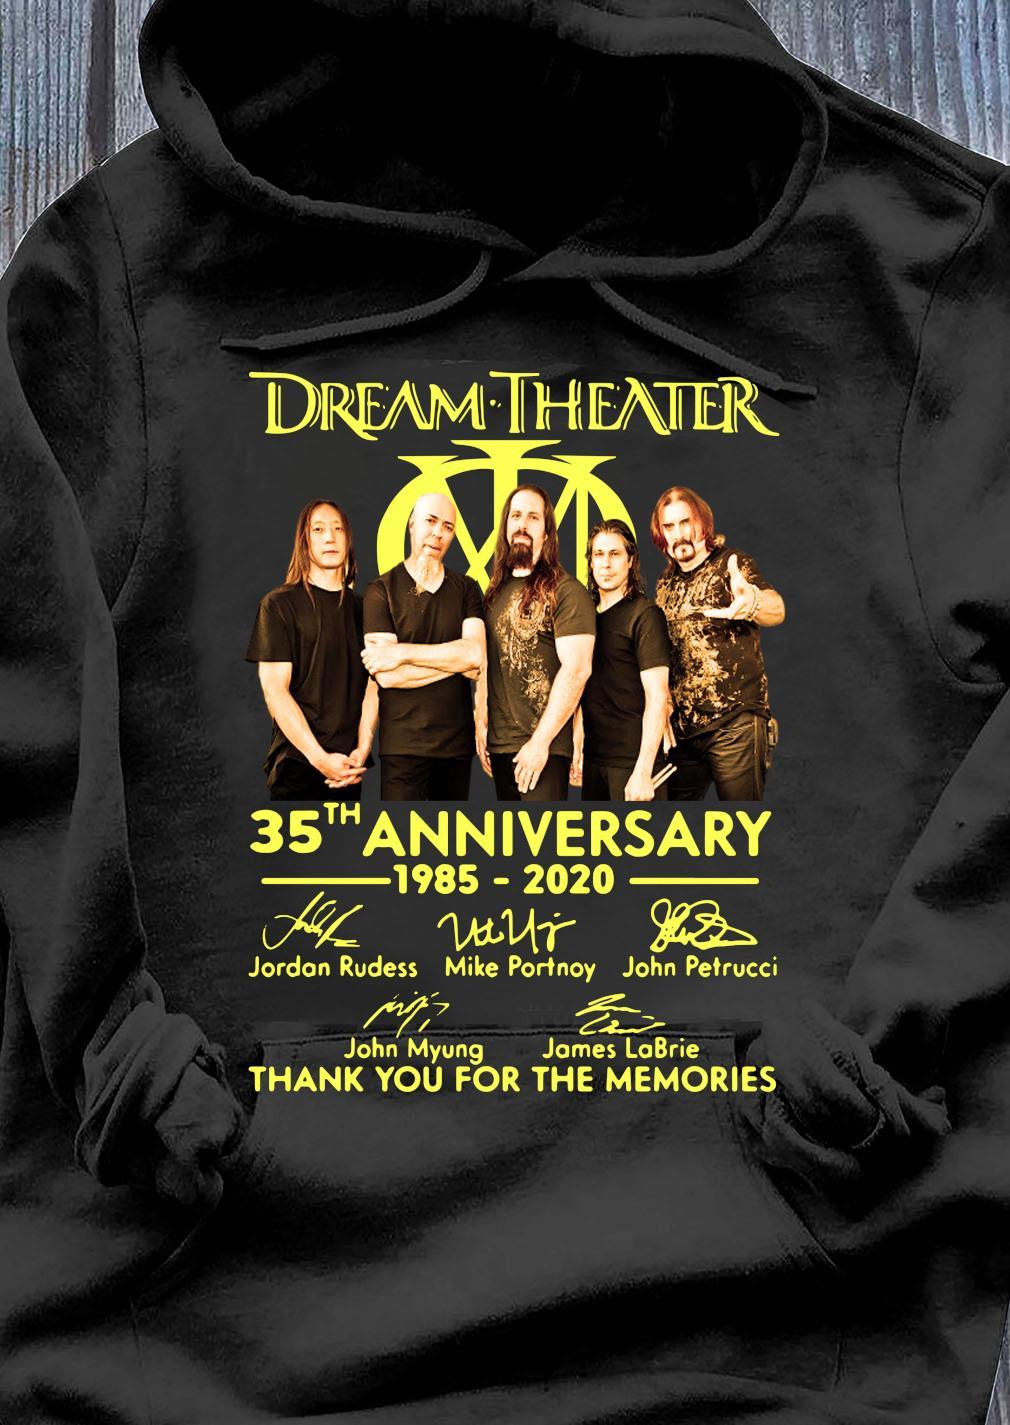 Dream Theater Progressive Metal Band 35th Anniversary 1985-2020 Member Signature Shirt Hoodie